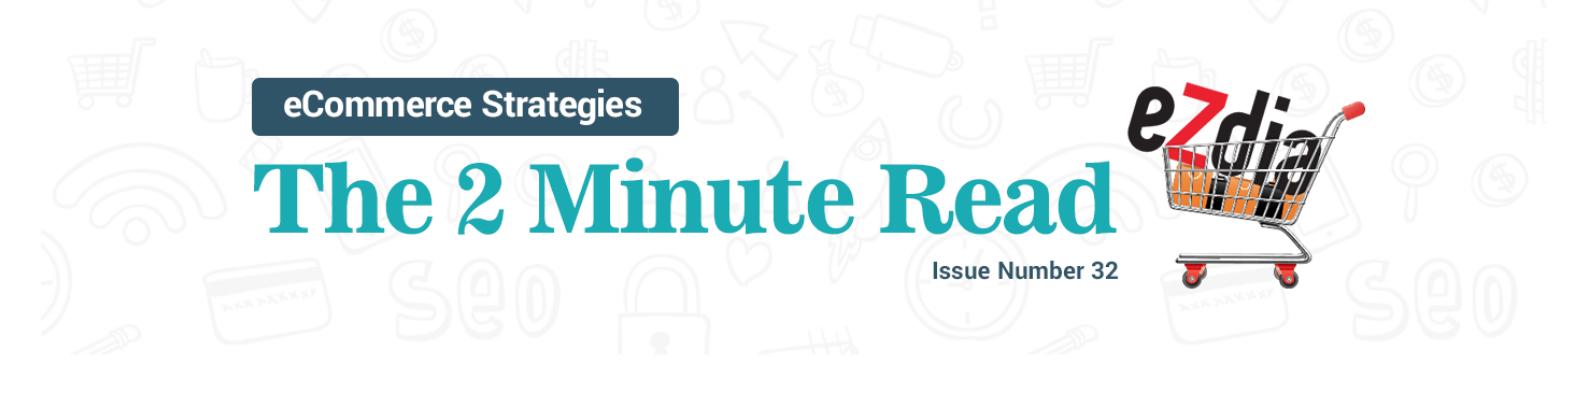 eCommerce Strategies - 2 Minute Read